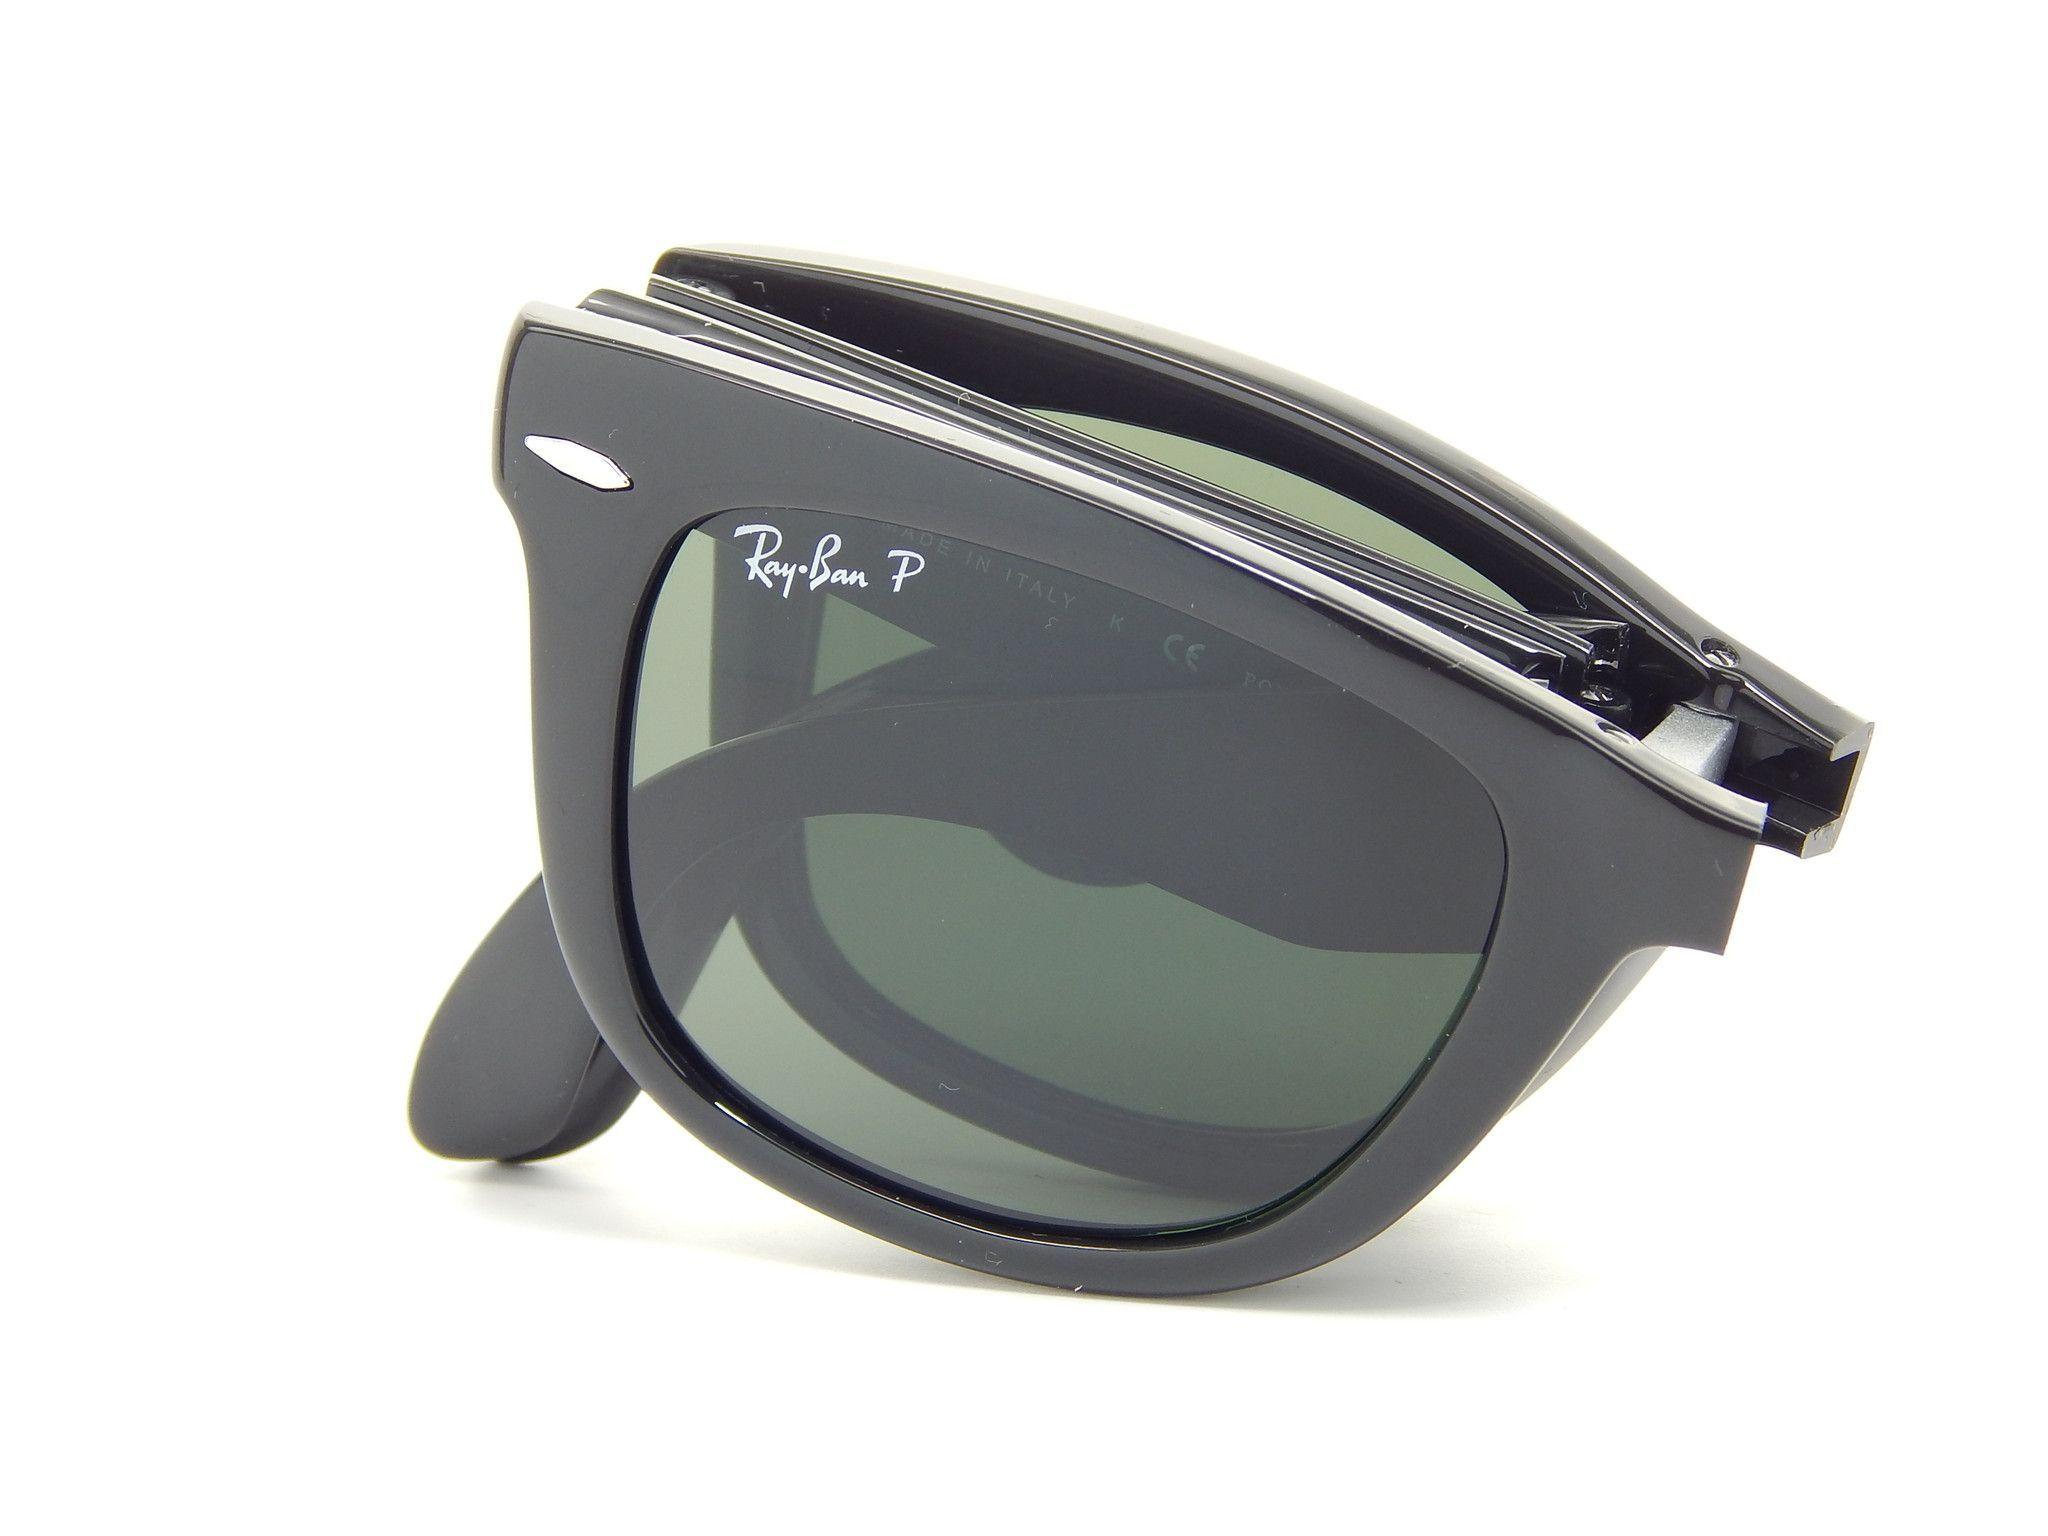 7181bc06d35ae Ray Ban Folding Wayfarer RB4105 601 58 Black Green Classic G-15 54mm  Polarized Sunglasses